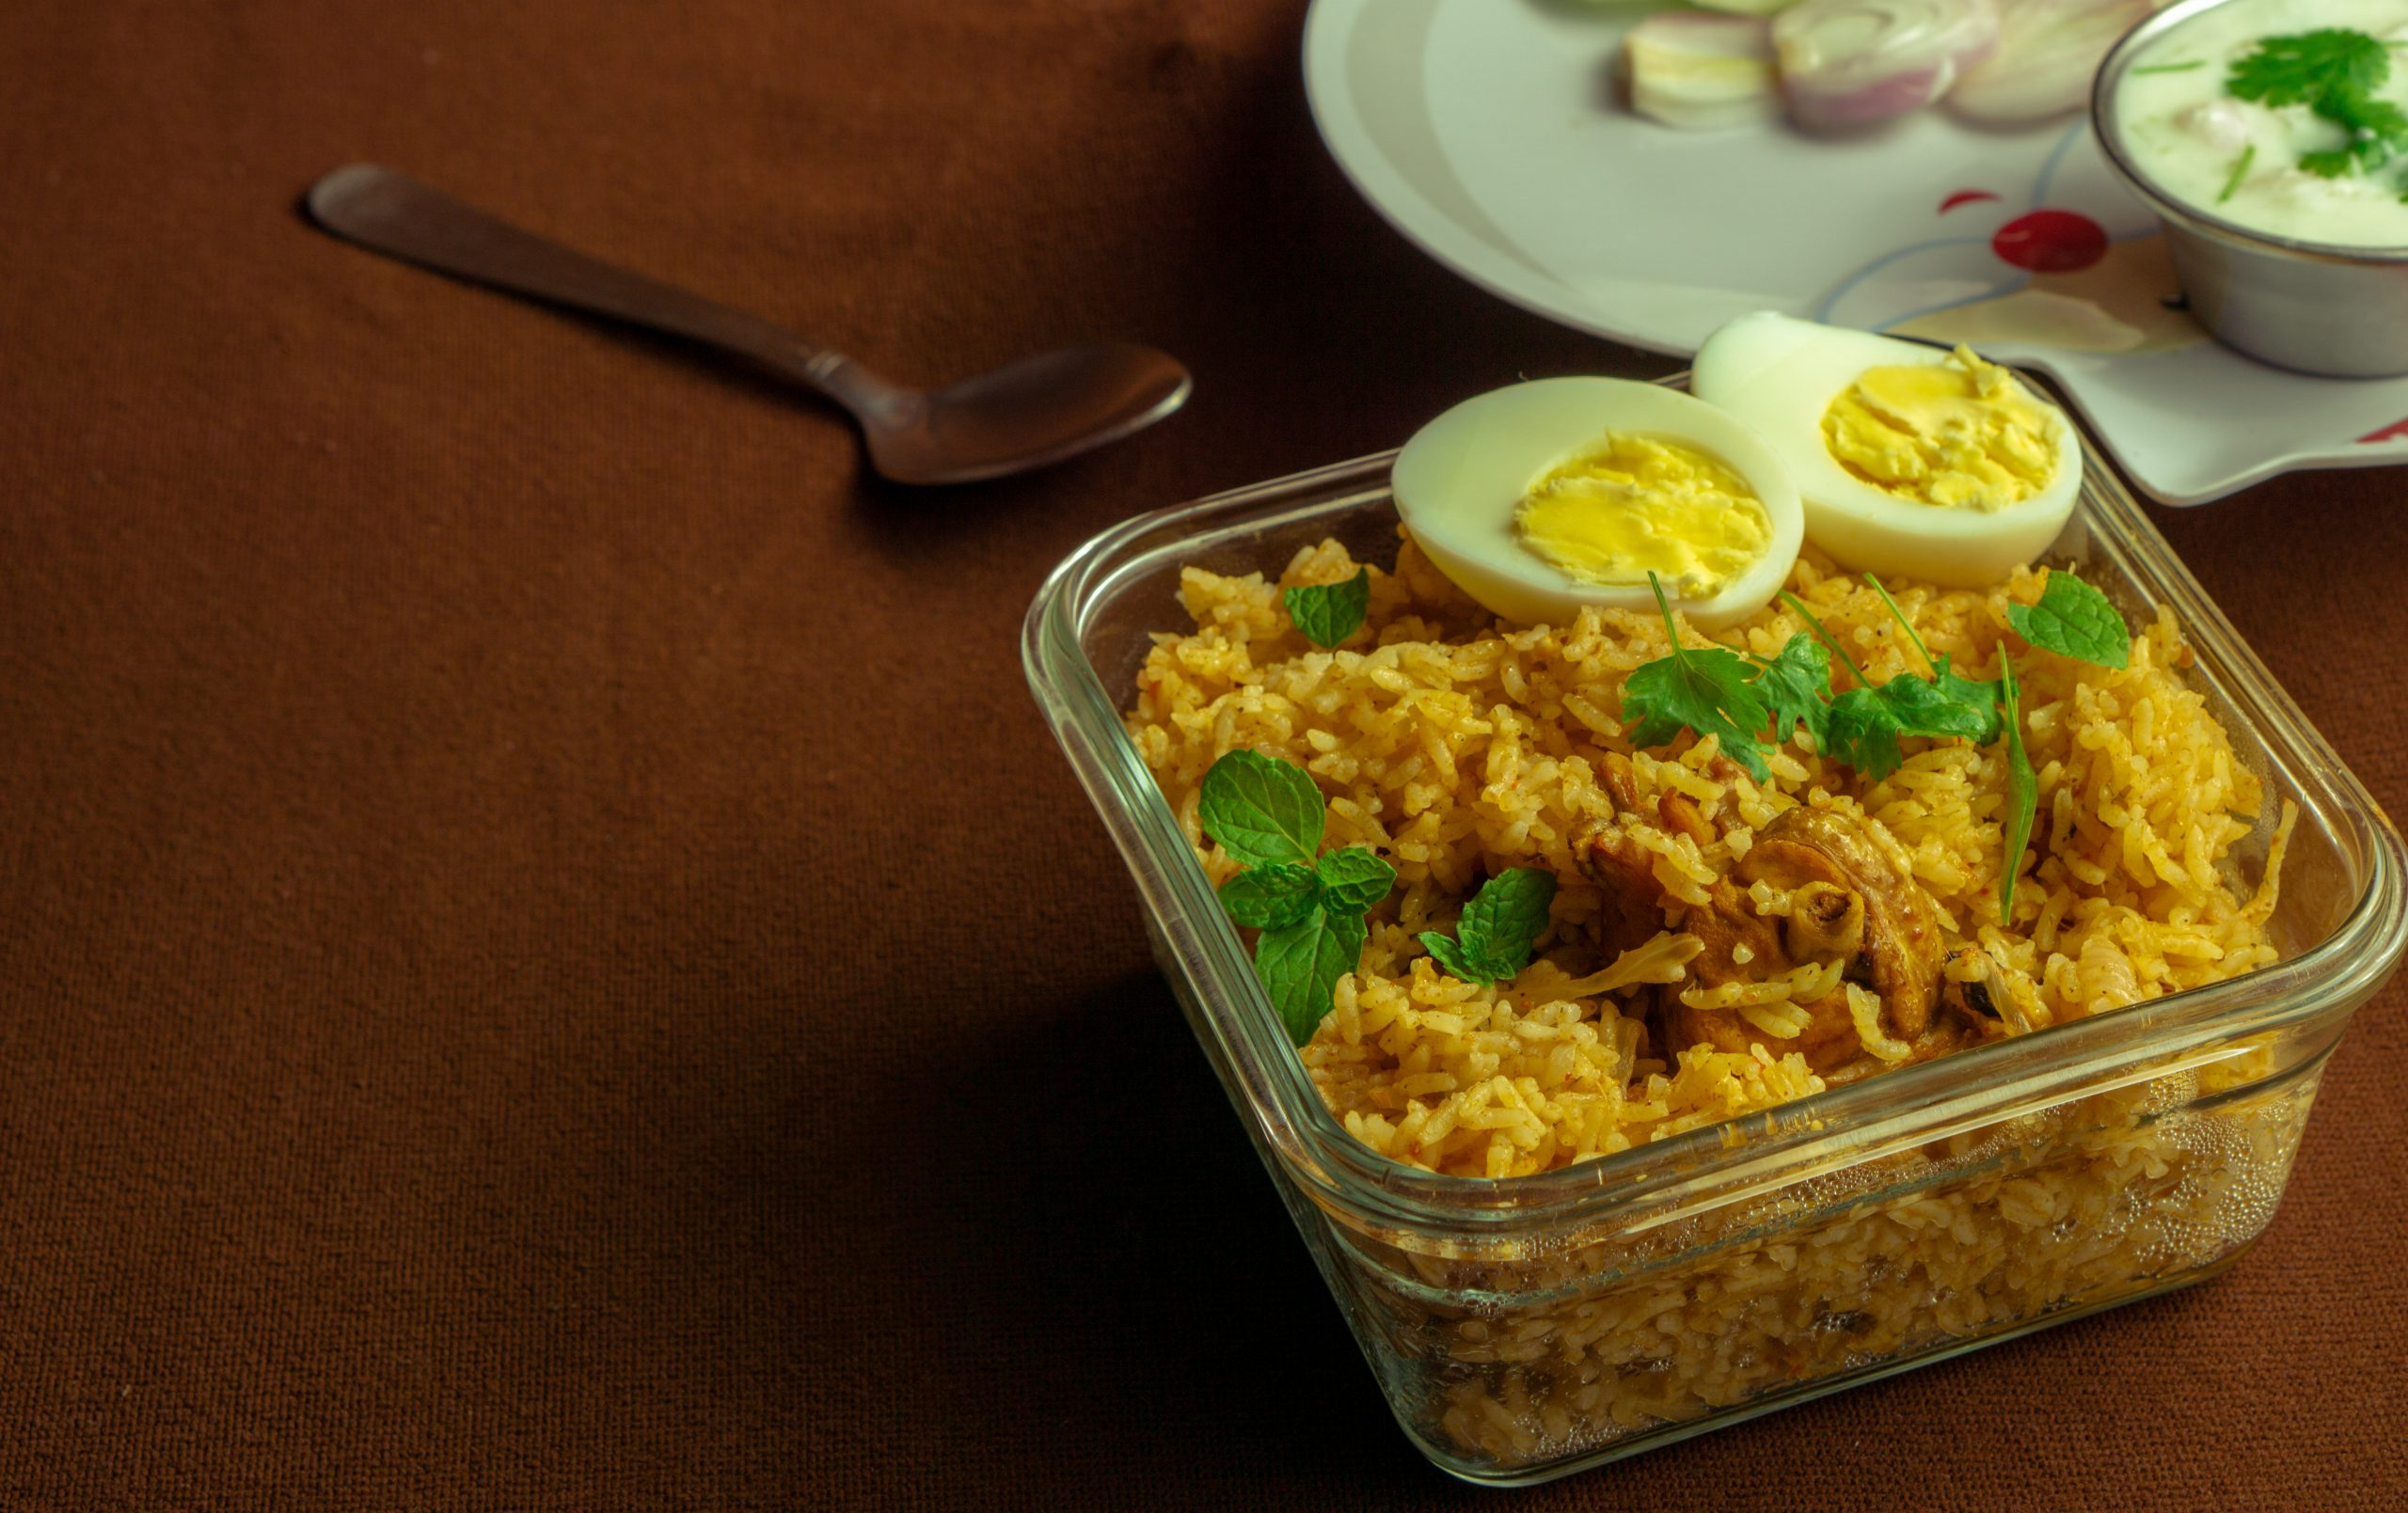 Saffron Rice on the Table